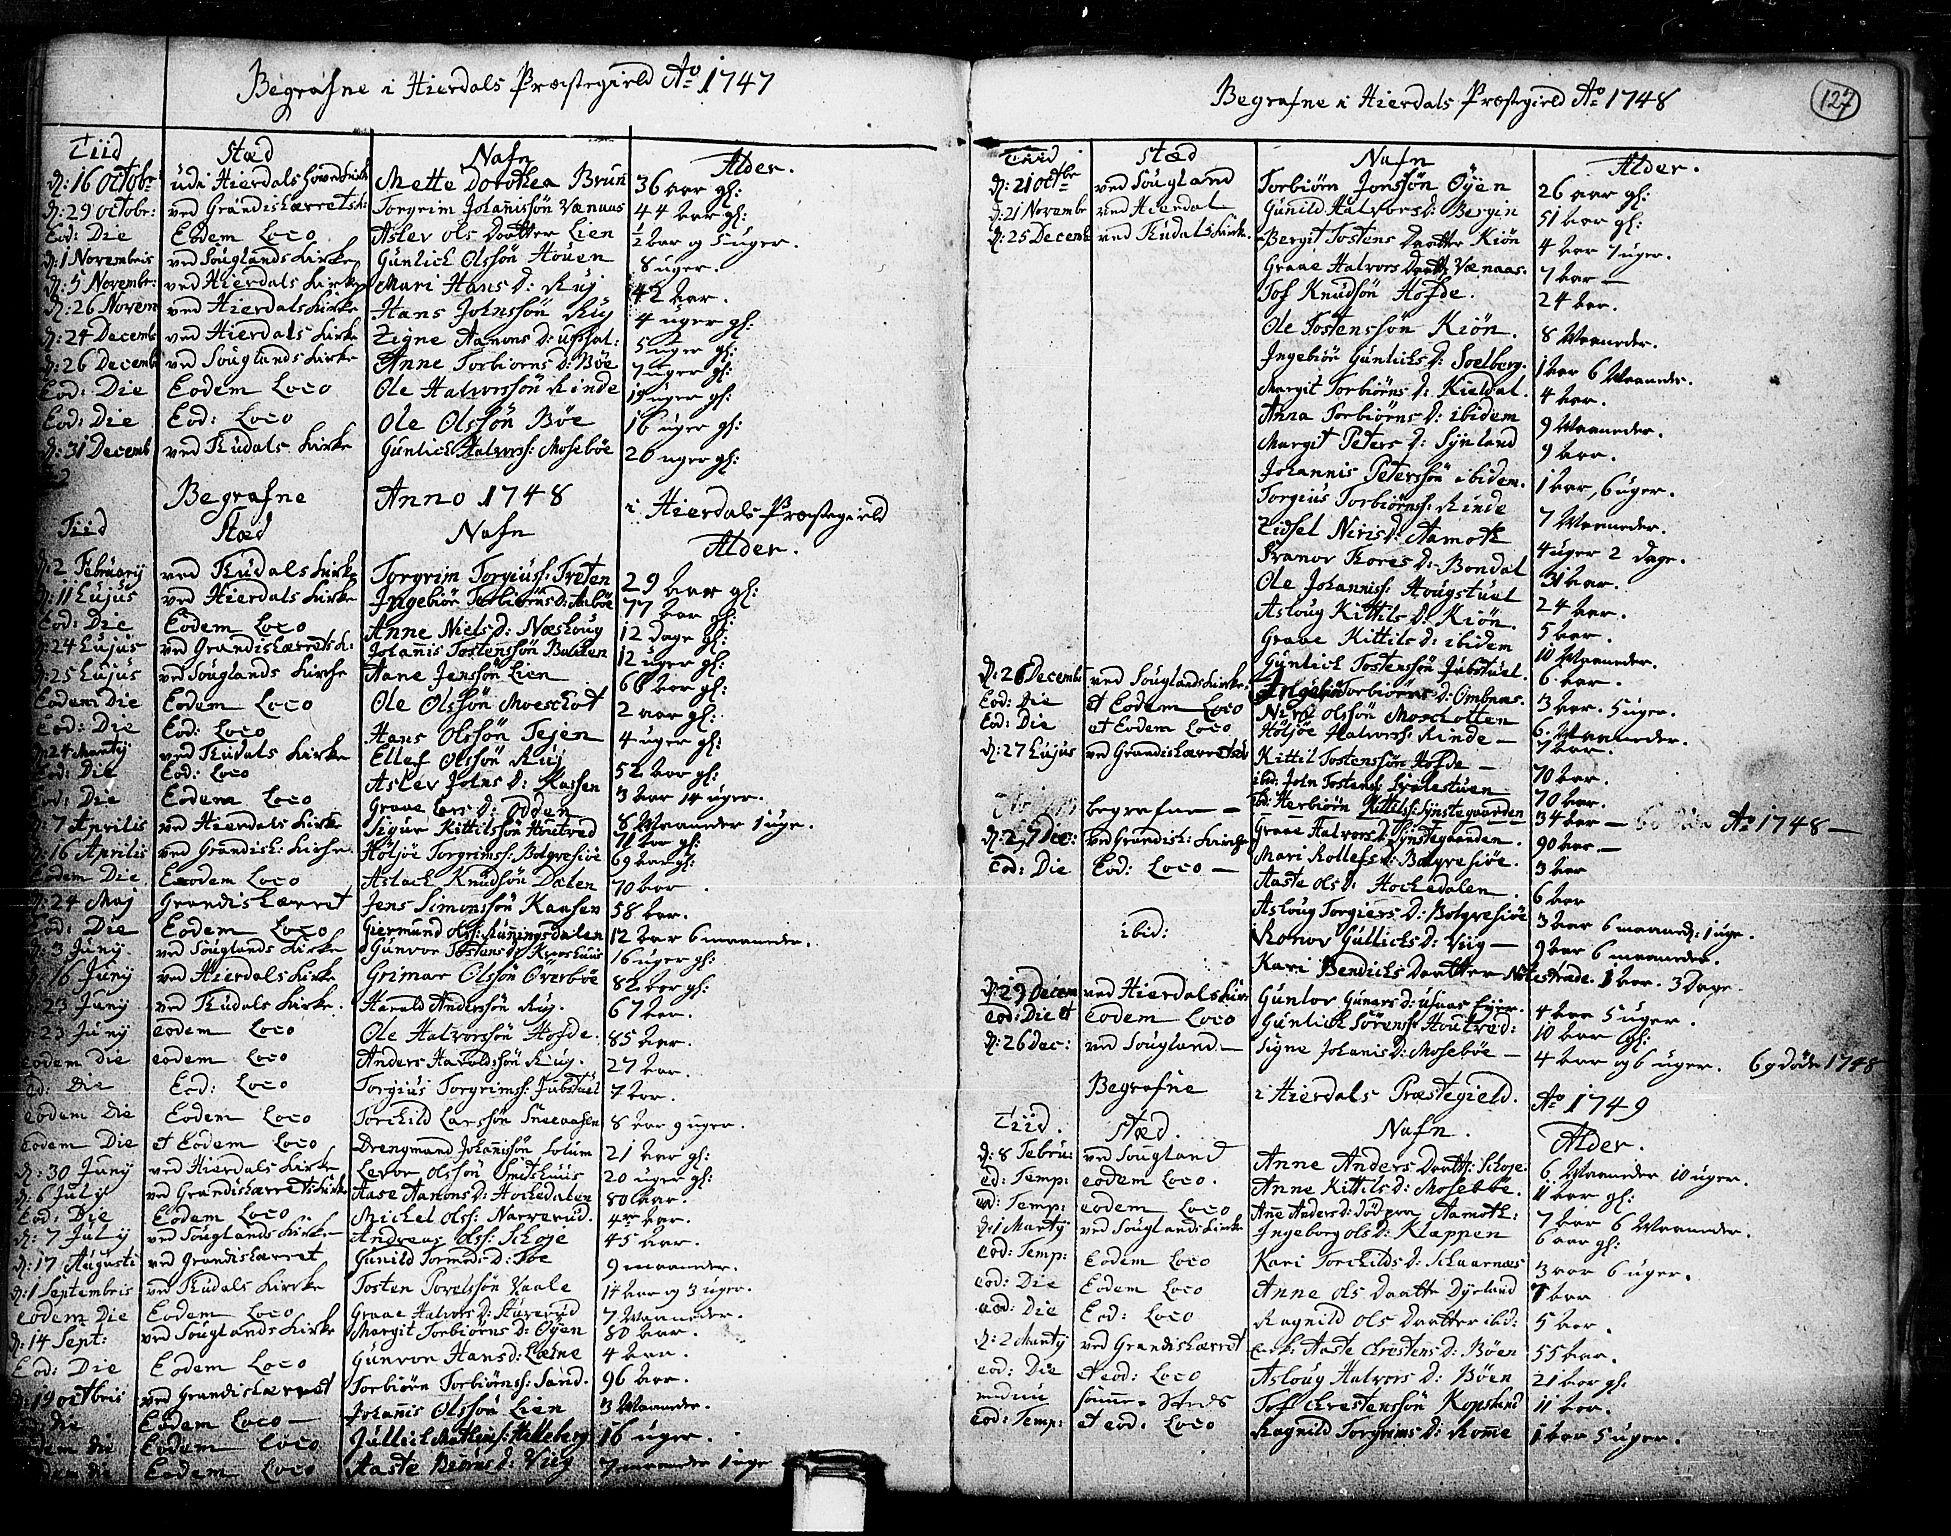 SAKO, Hjartdal kirkebøker, F/Fa/L0003: Ministerialbok nr. I 3, 1727-1775, s. 127